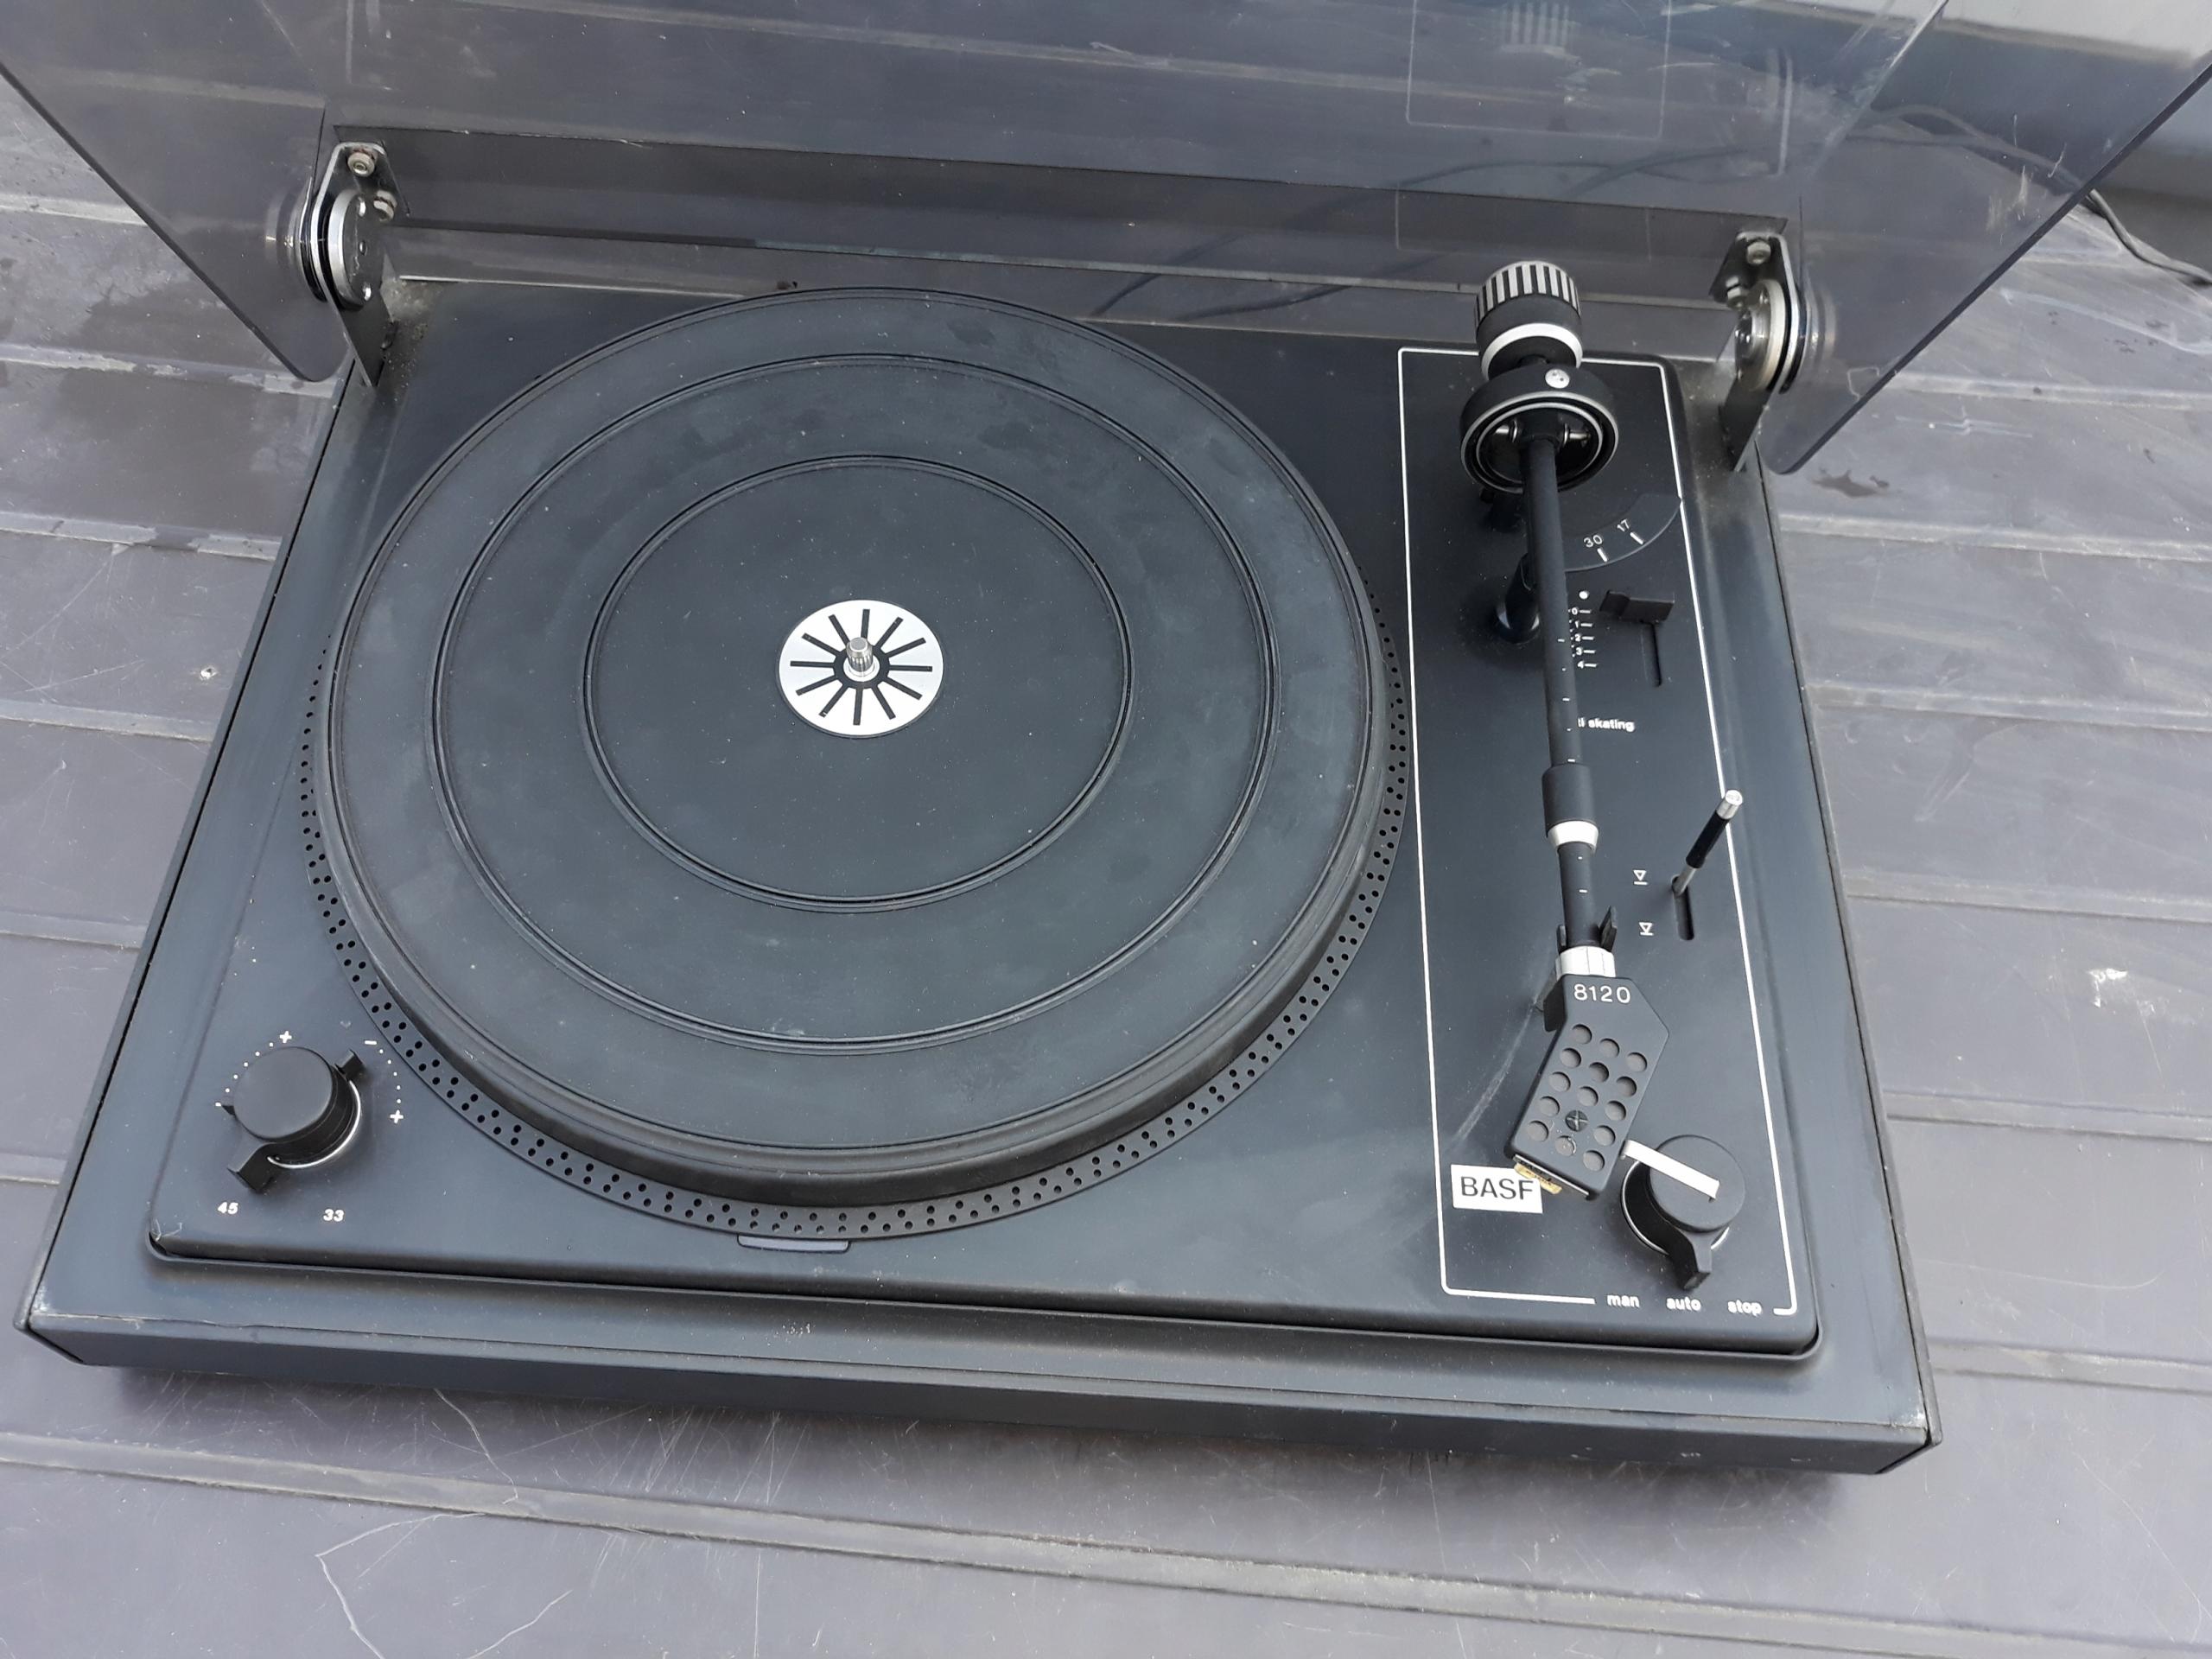 Gramofon BASF 8120 (LENCO)